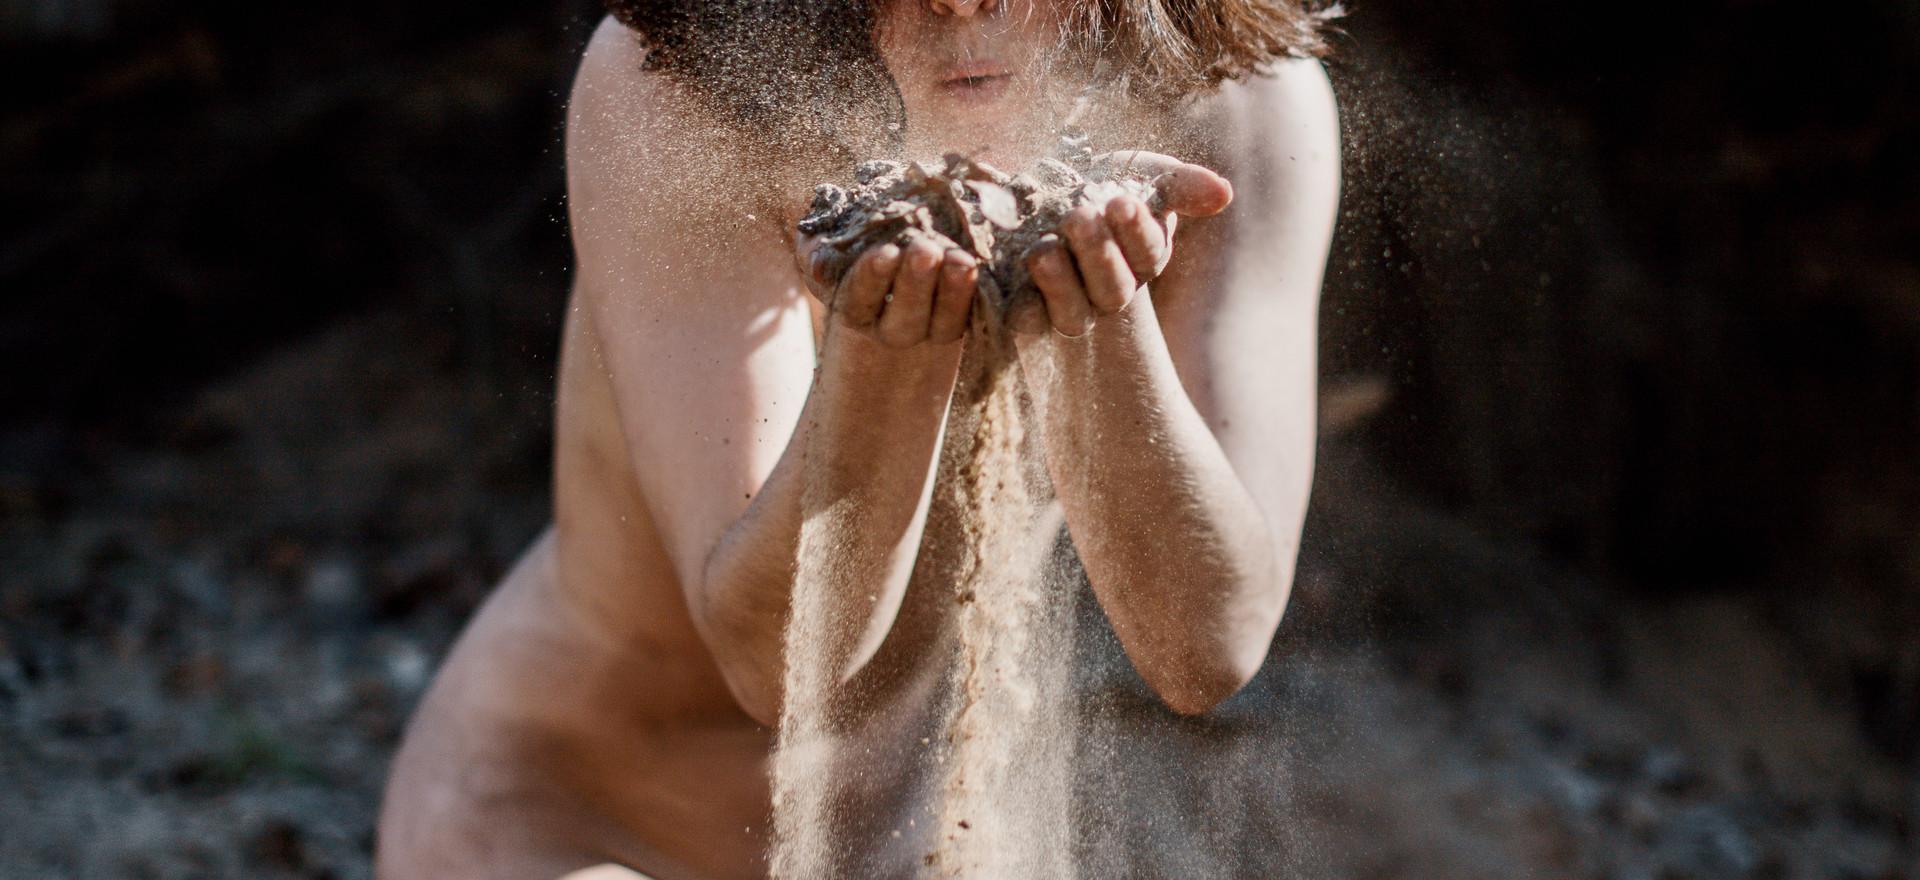 Der Sandmann.